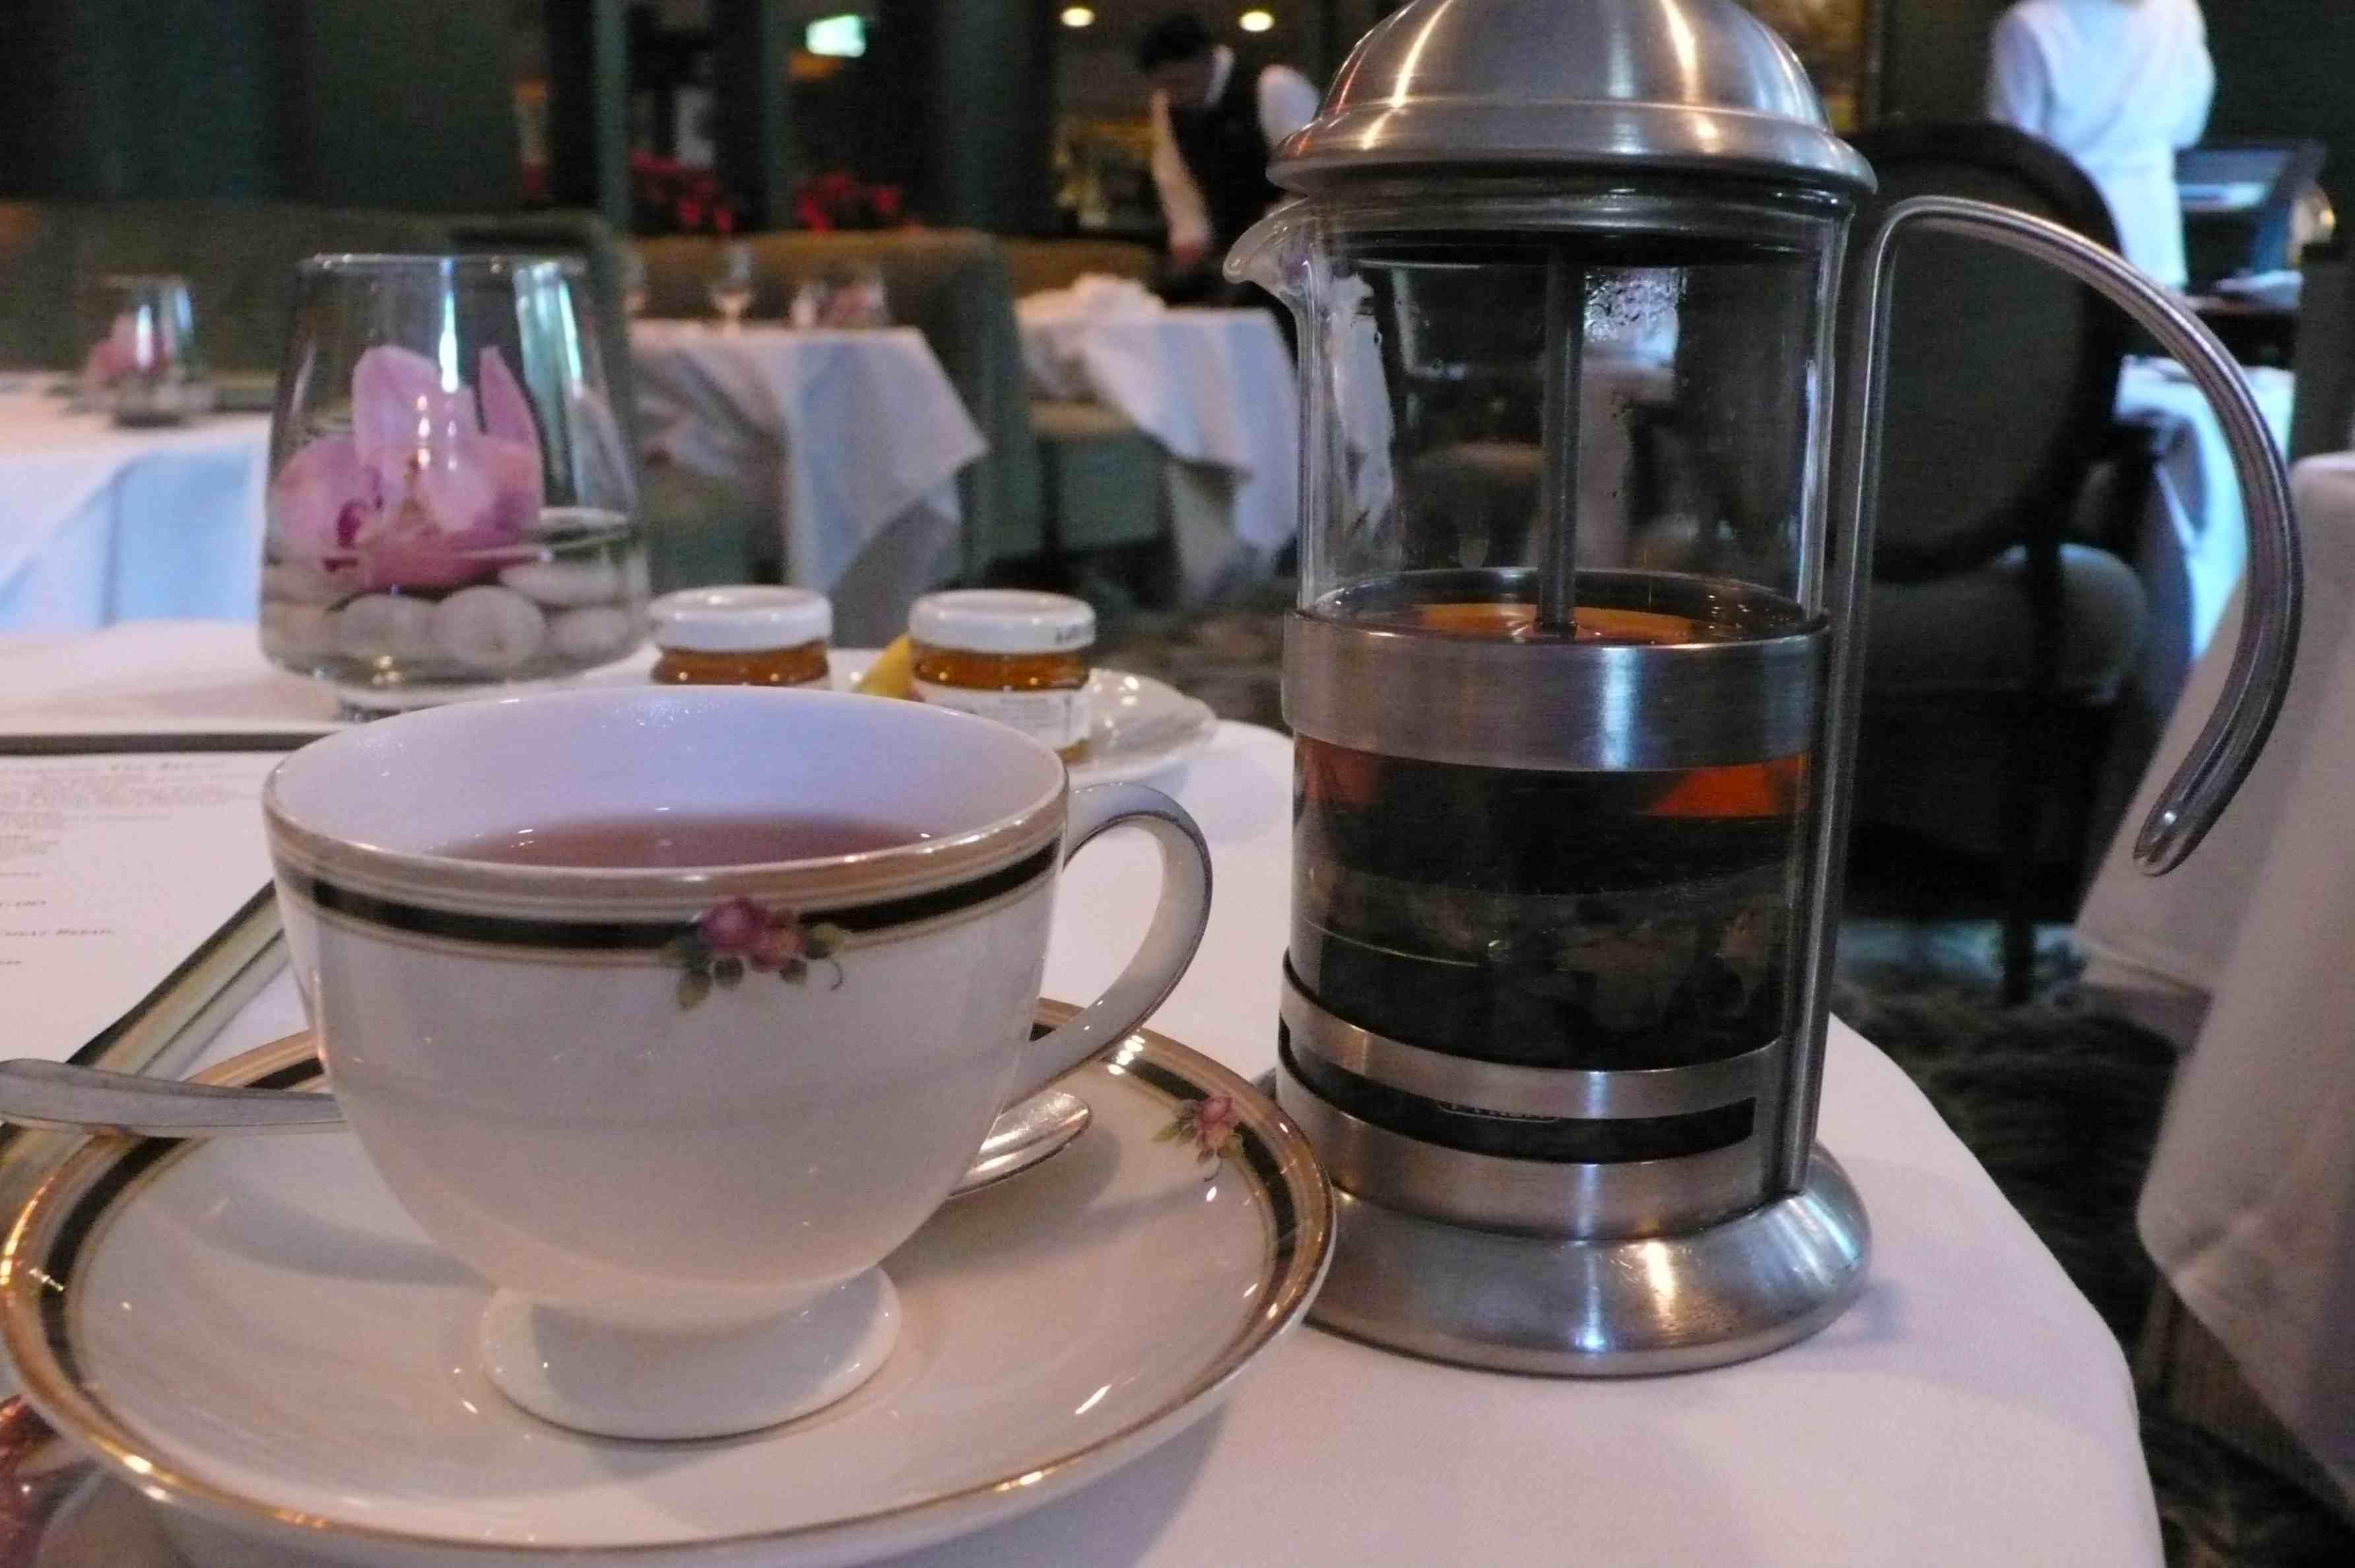 Tea and diffuser